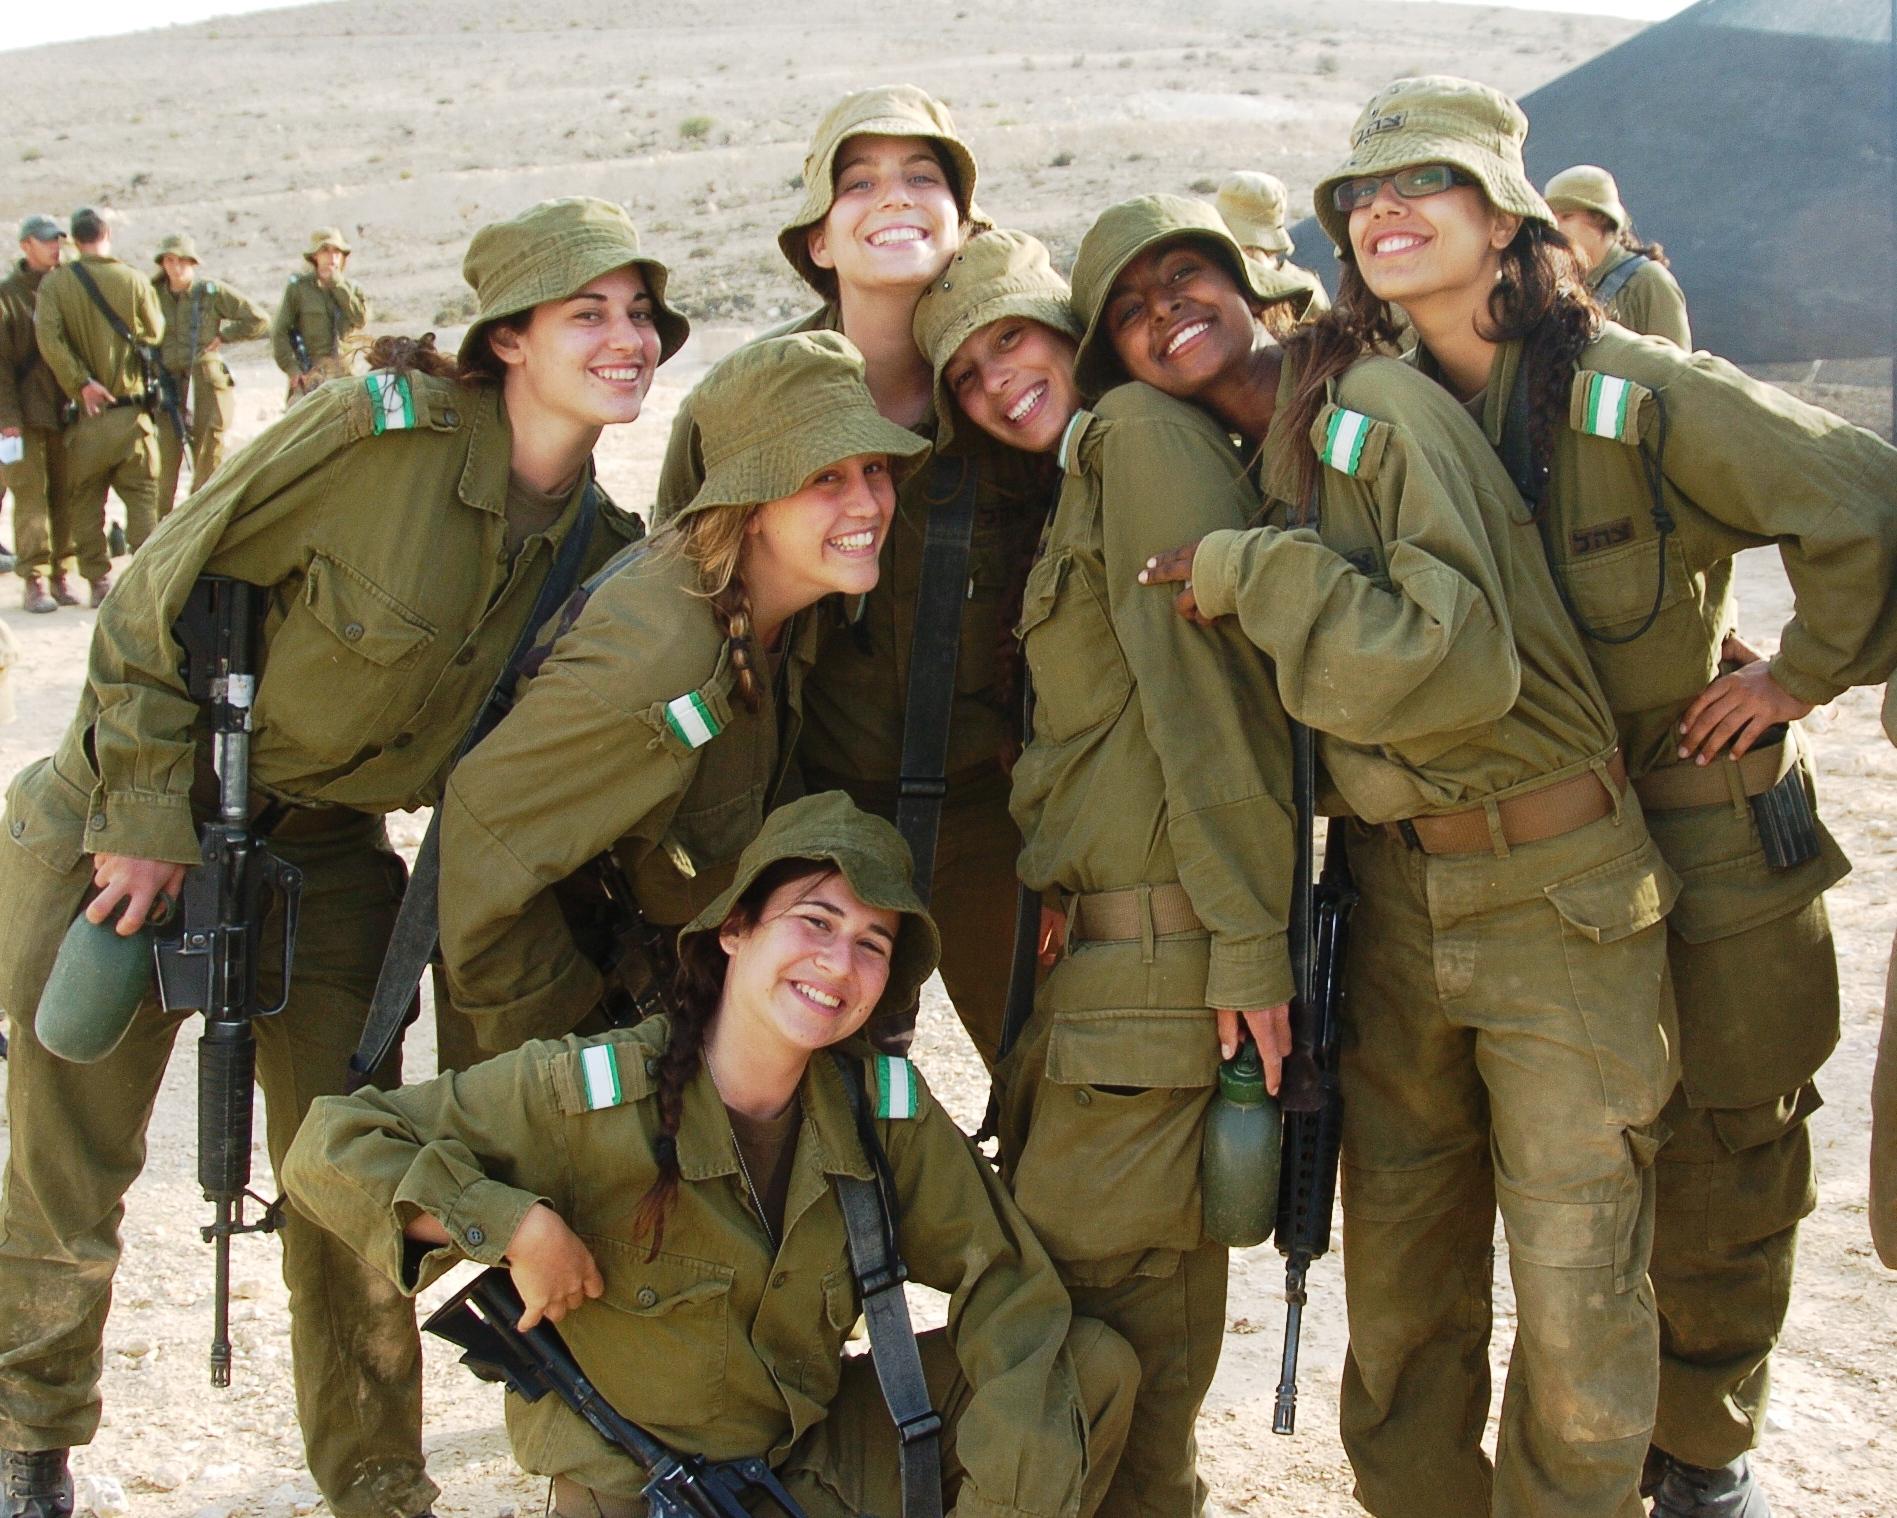 army-recruitment-video-girls-nude-girls-walking-castle